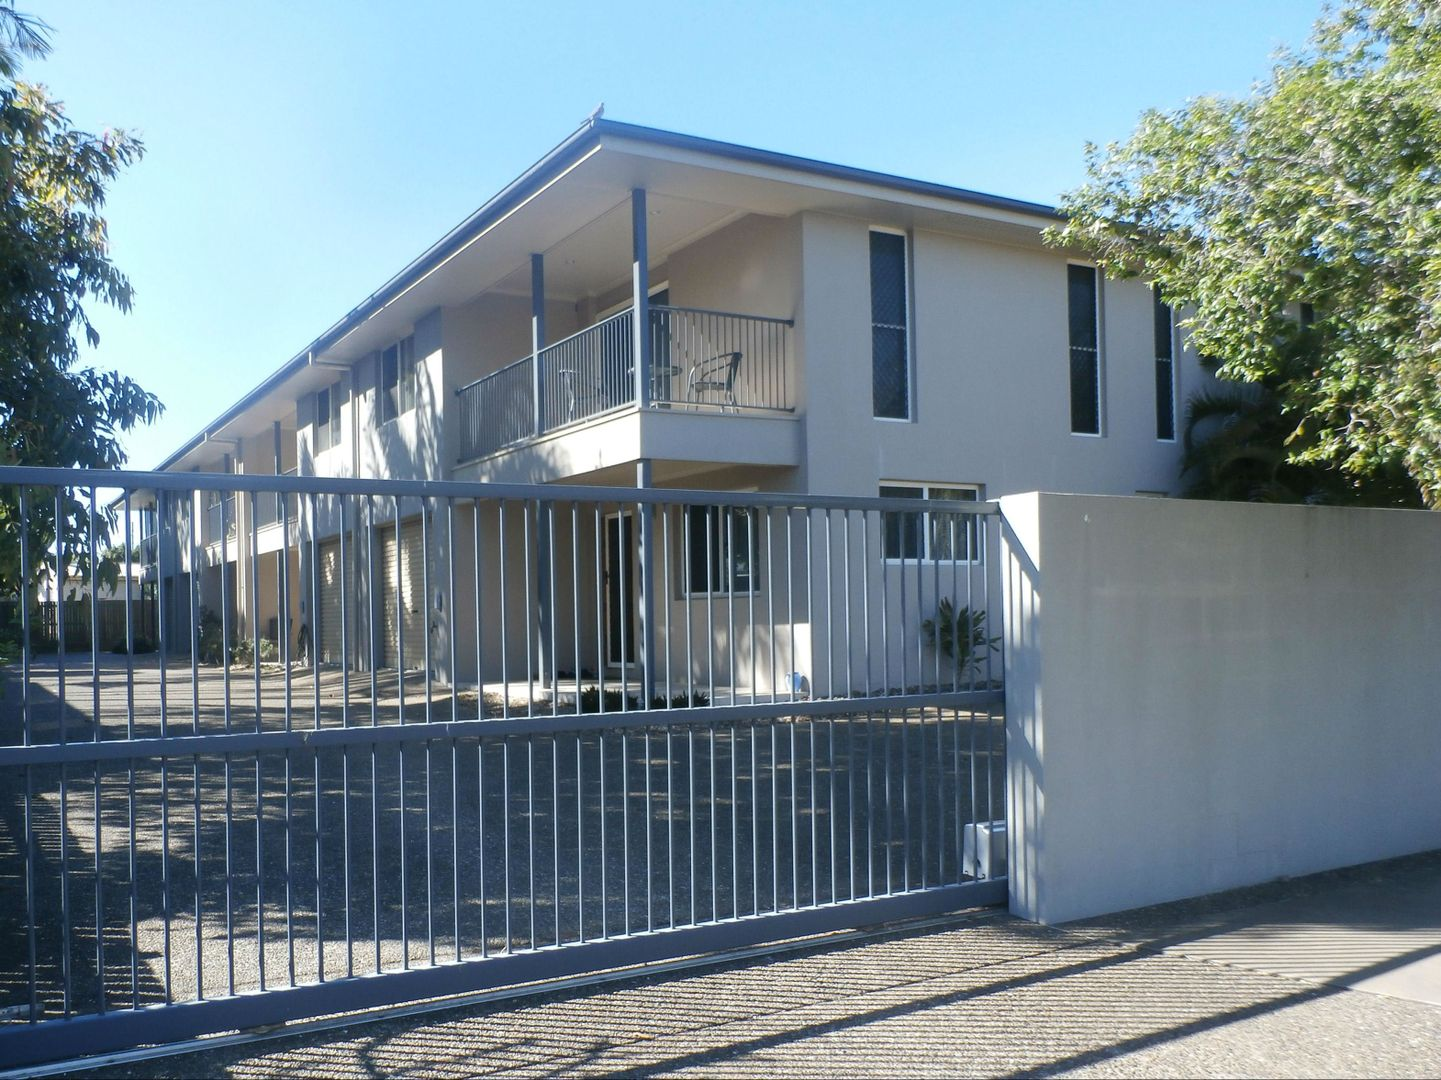 3/18 Water Street, Bundaberg South QLD 4670, Image 0